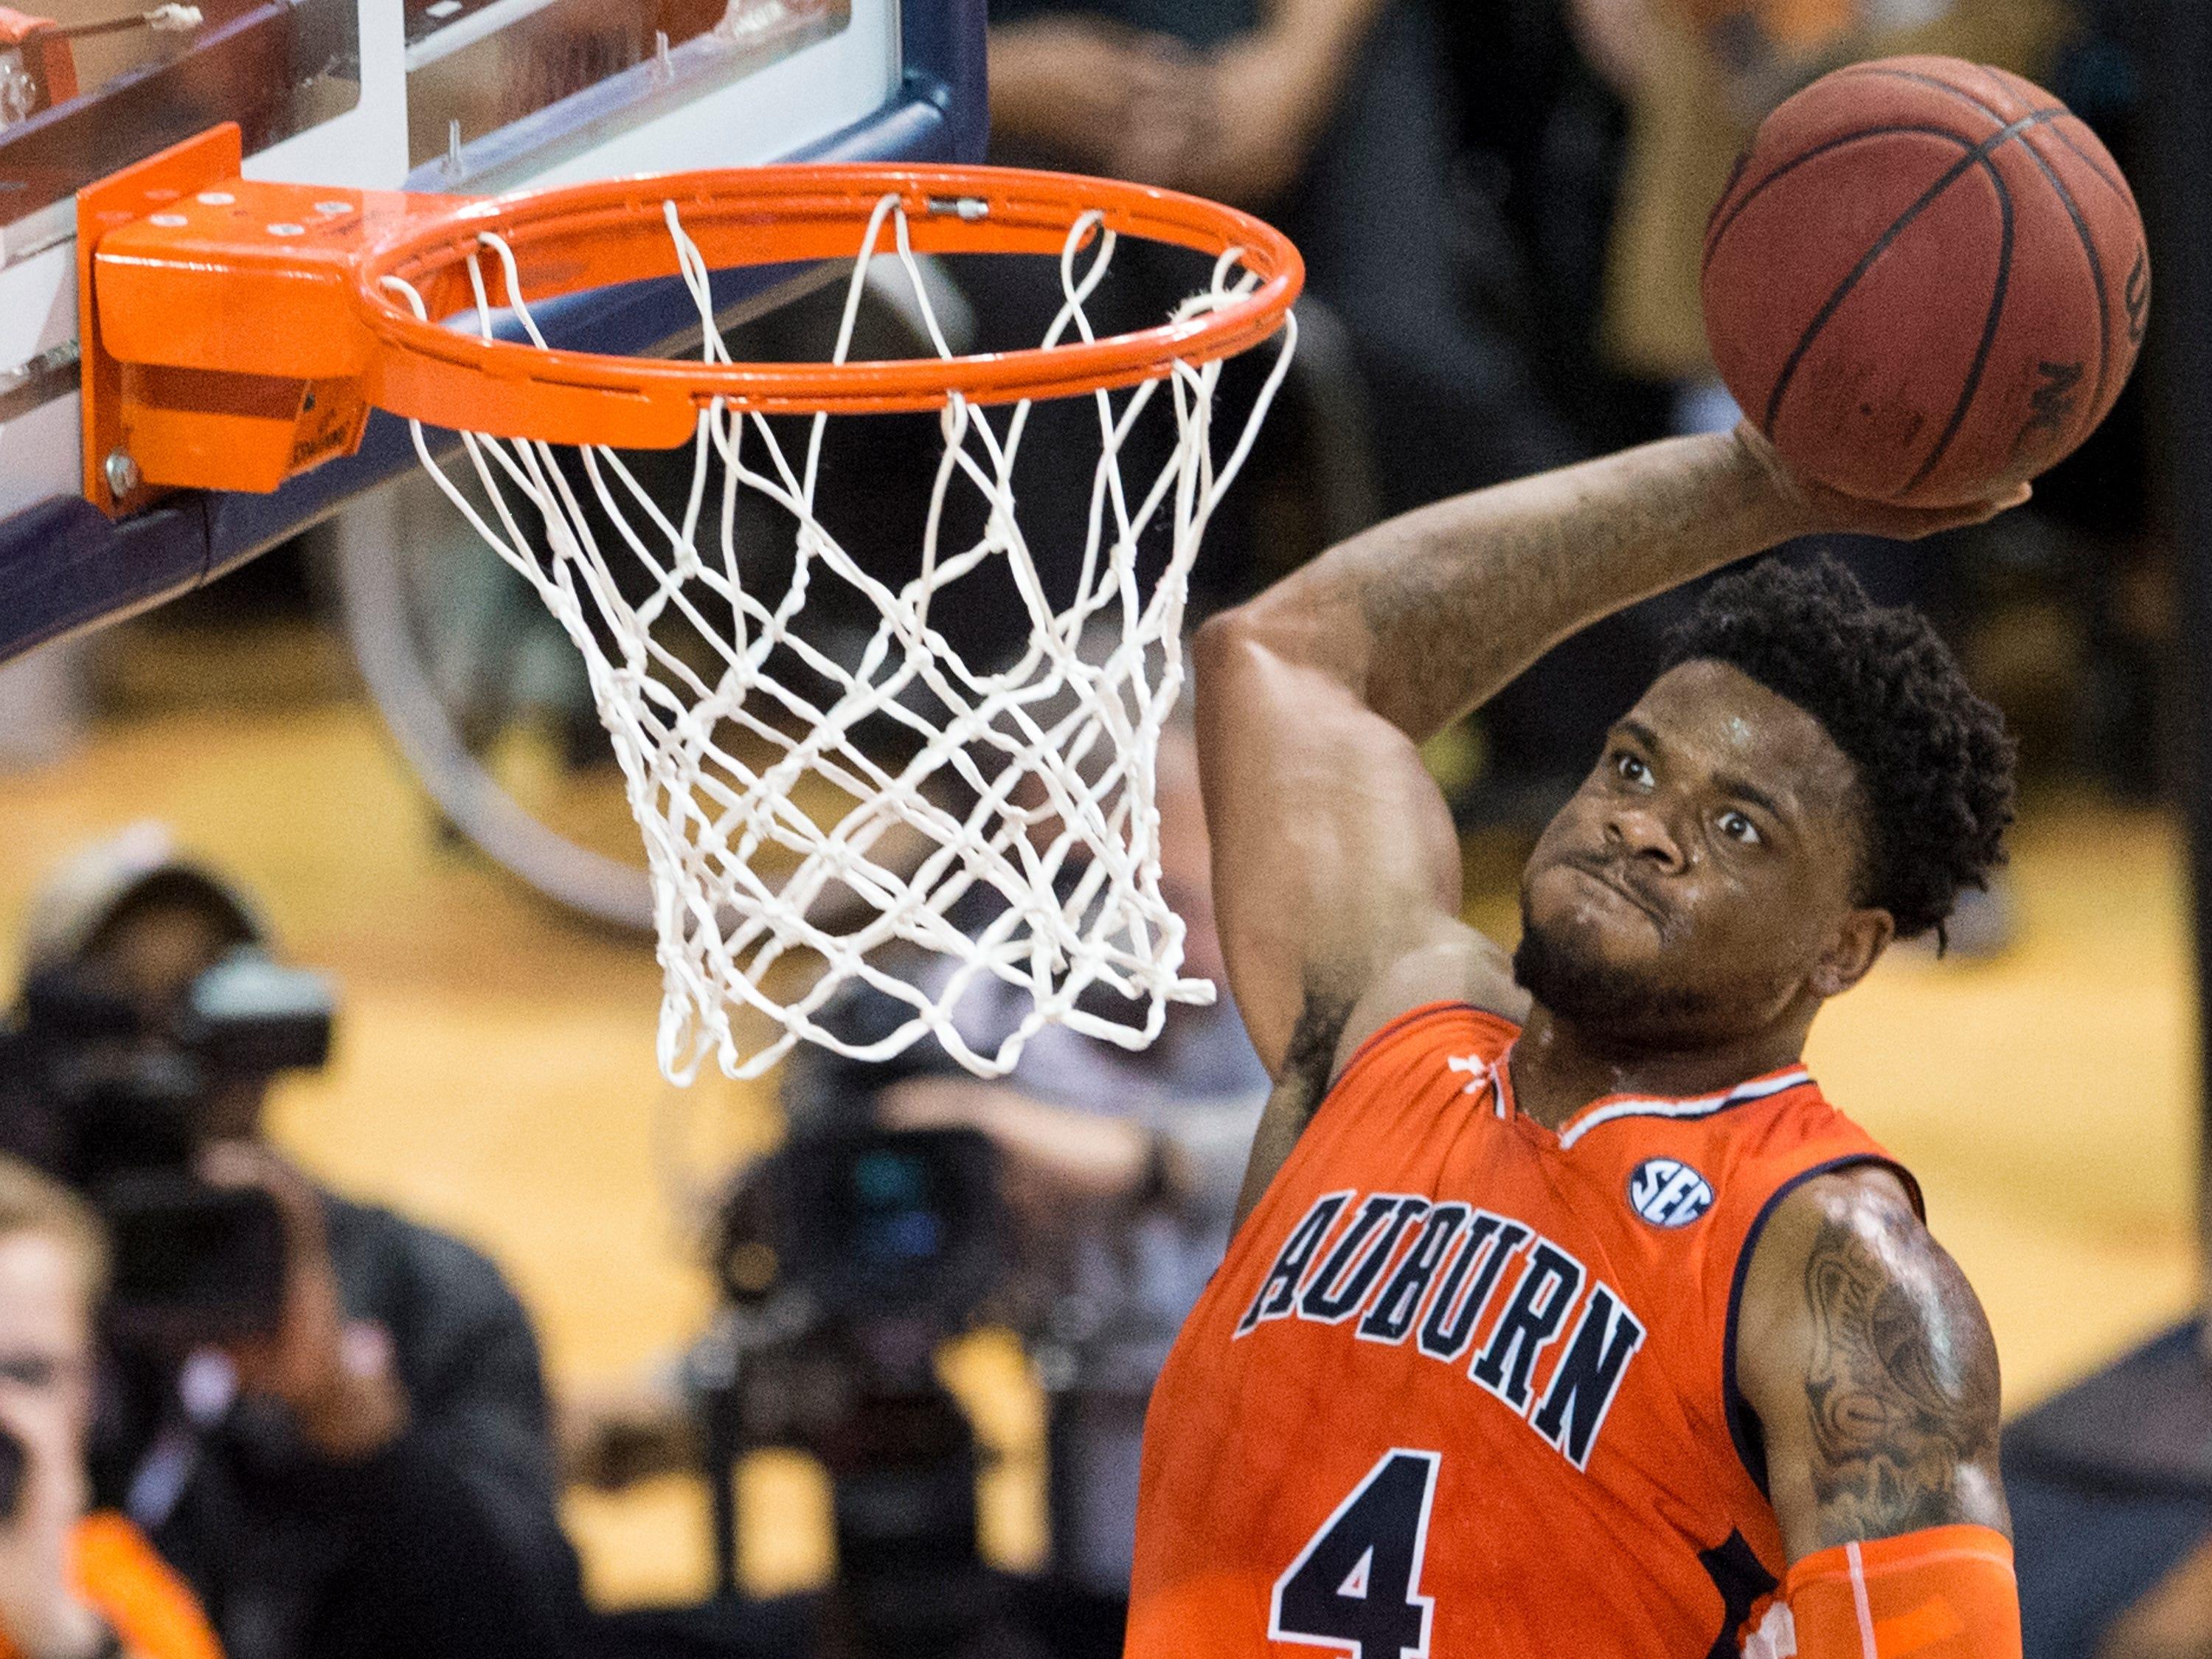 Auburn guard Malik Dunbar (4) dunks the ball at Auburn Arena in Auburn, Ala., on Saturday, Feb. 2, 2019. Auburn defeated Alabama 84-63.